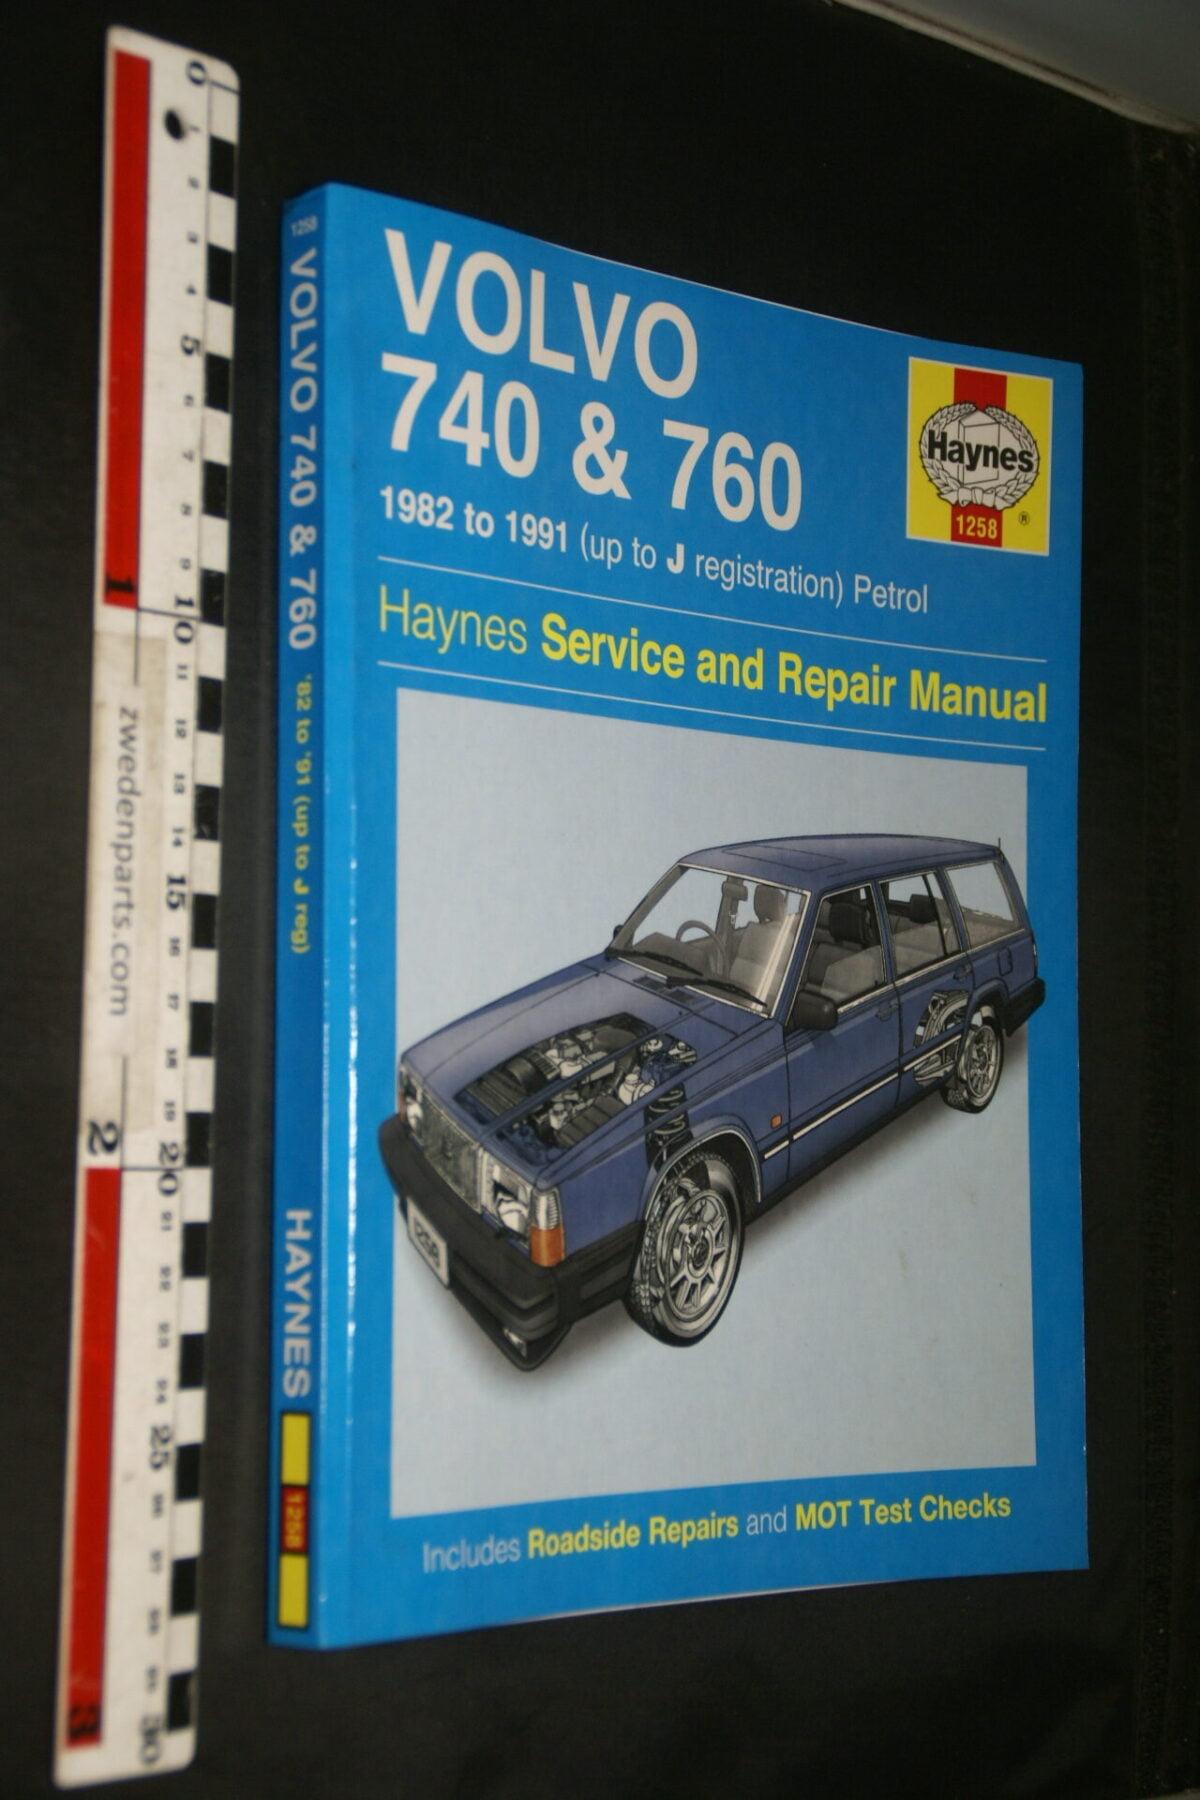 DSC03651 1991 origineel Haynes boek Service and repairmanual Volvo 740  760 nr ISBN 9780857337474, English-baffaddd